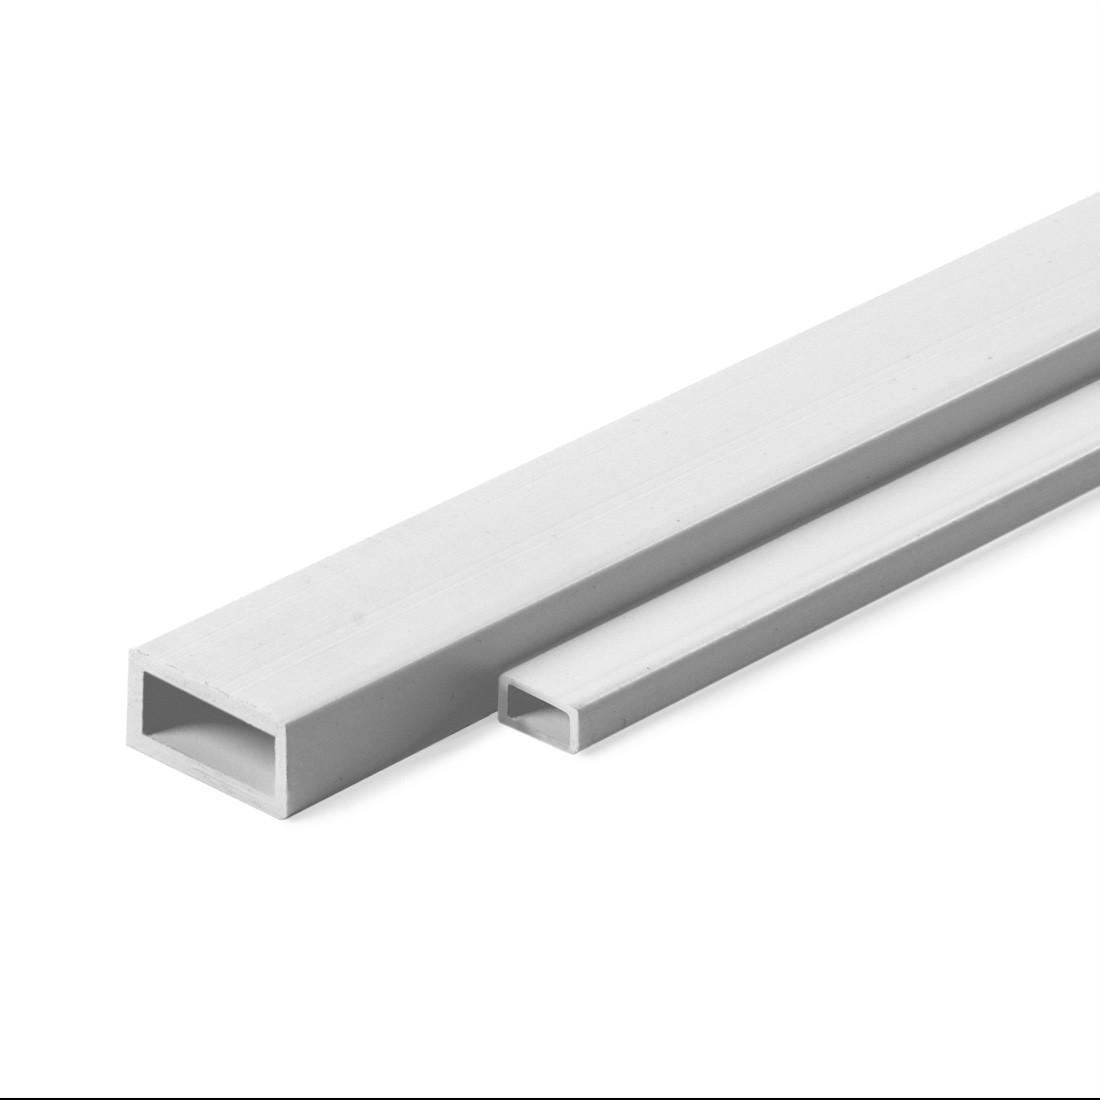 ASA rectang. tube profile mm.2x4x1000